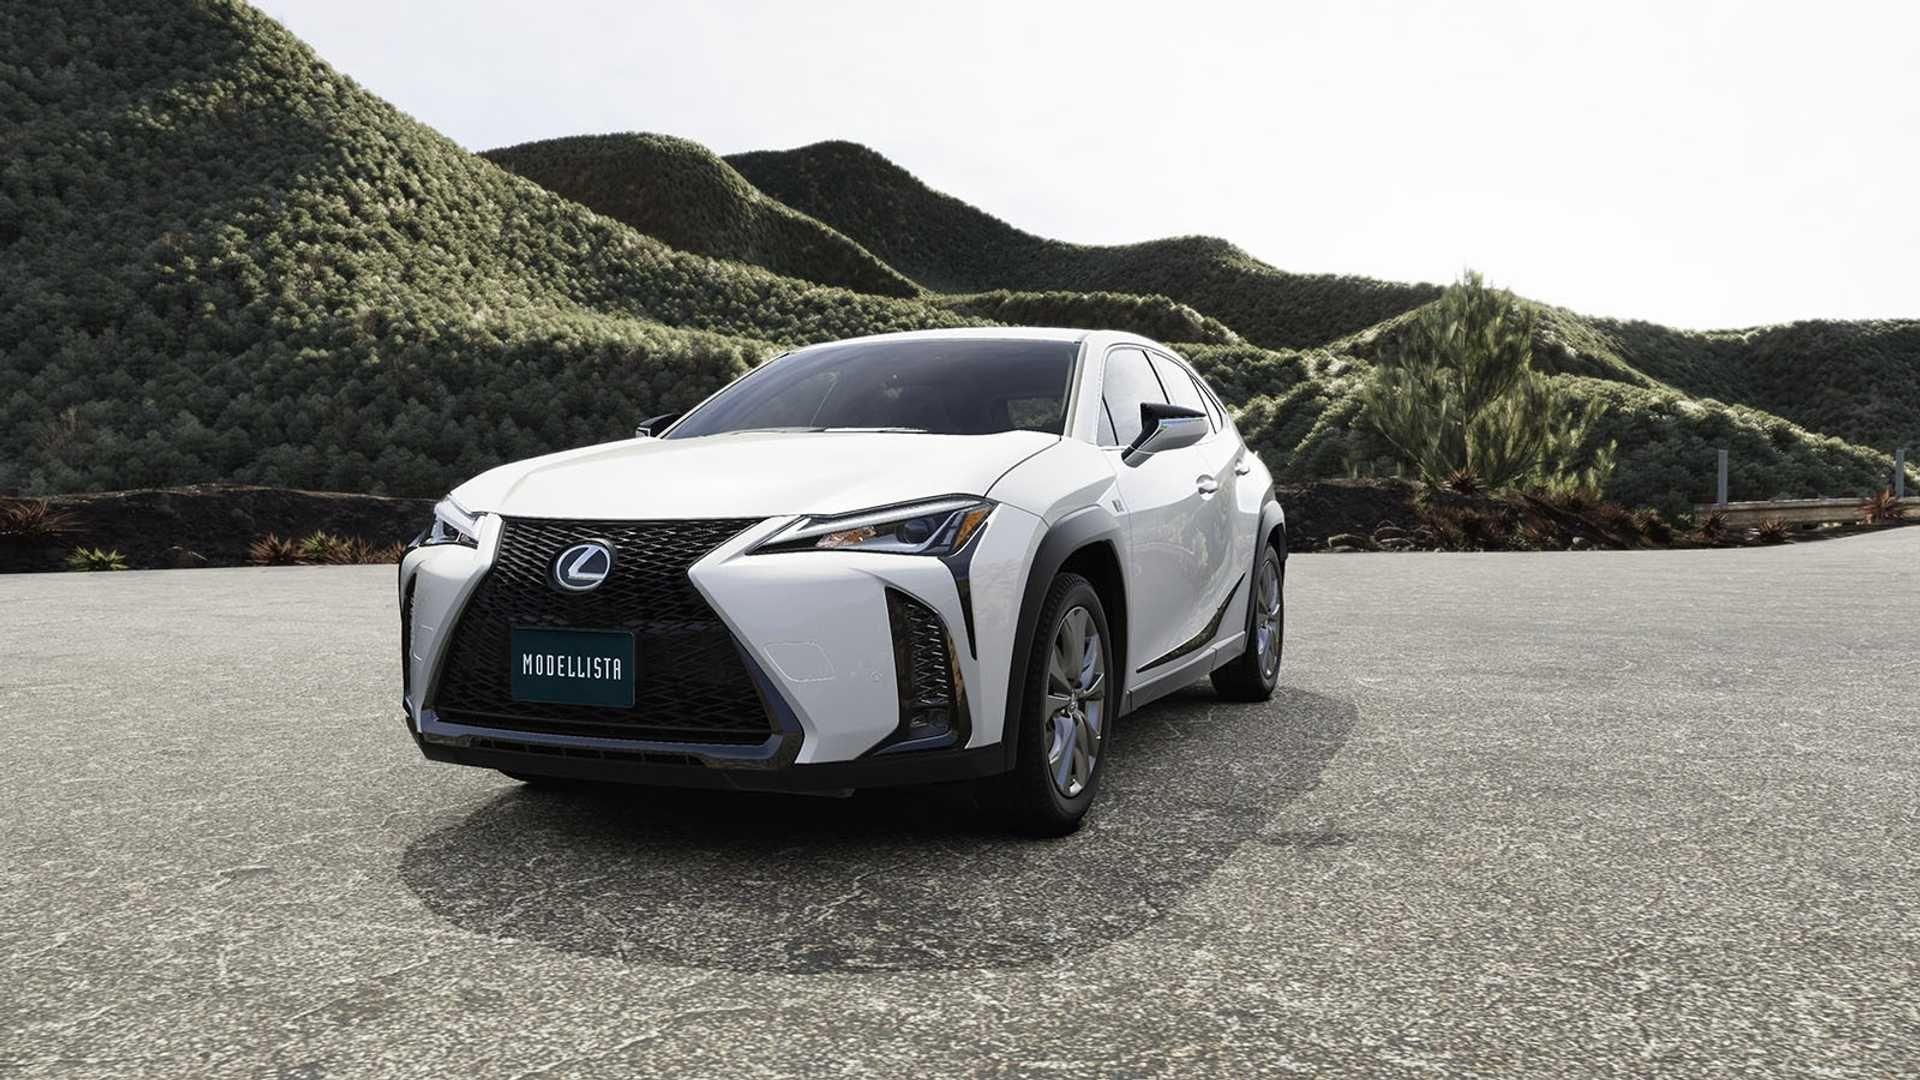 Modifikasi Mobil Lexus Modifikasi Modifikasi Mobil Mobil Kendaraan